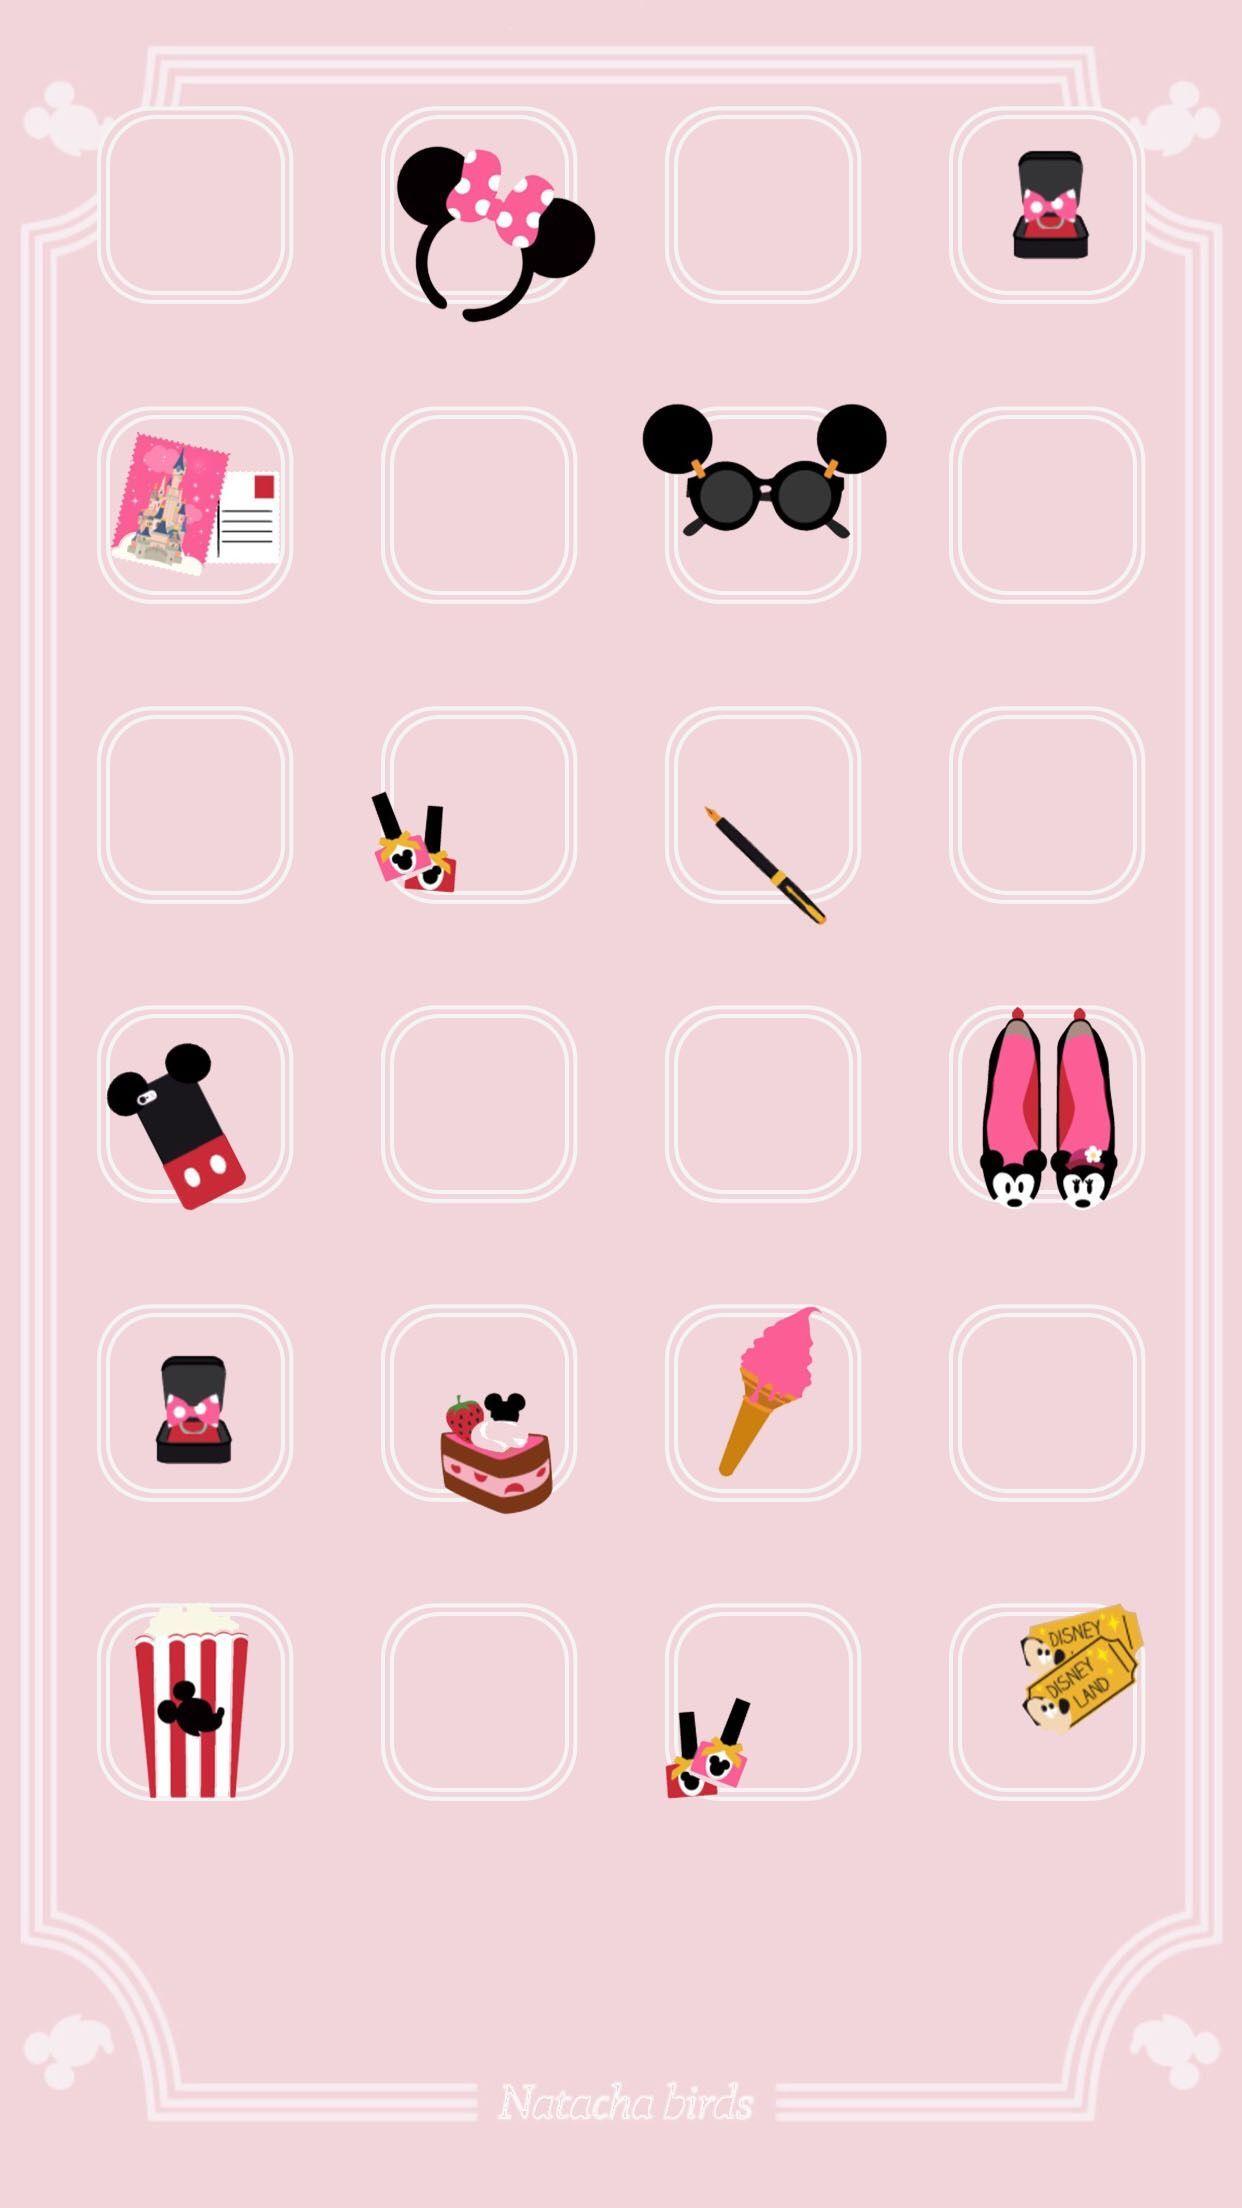 Pin Oleh Thalia Xie Di Seni Dengan Gambar Wallpaper Lucu Lucu In 2020 Iphone Homescreen Wallpaper Cute Home Screens Cute Home Screen Wallpaper